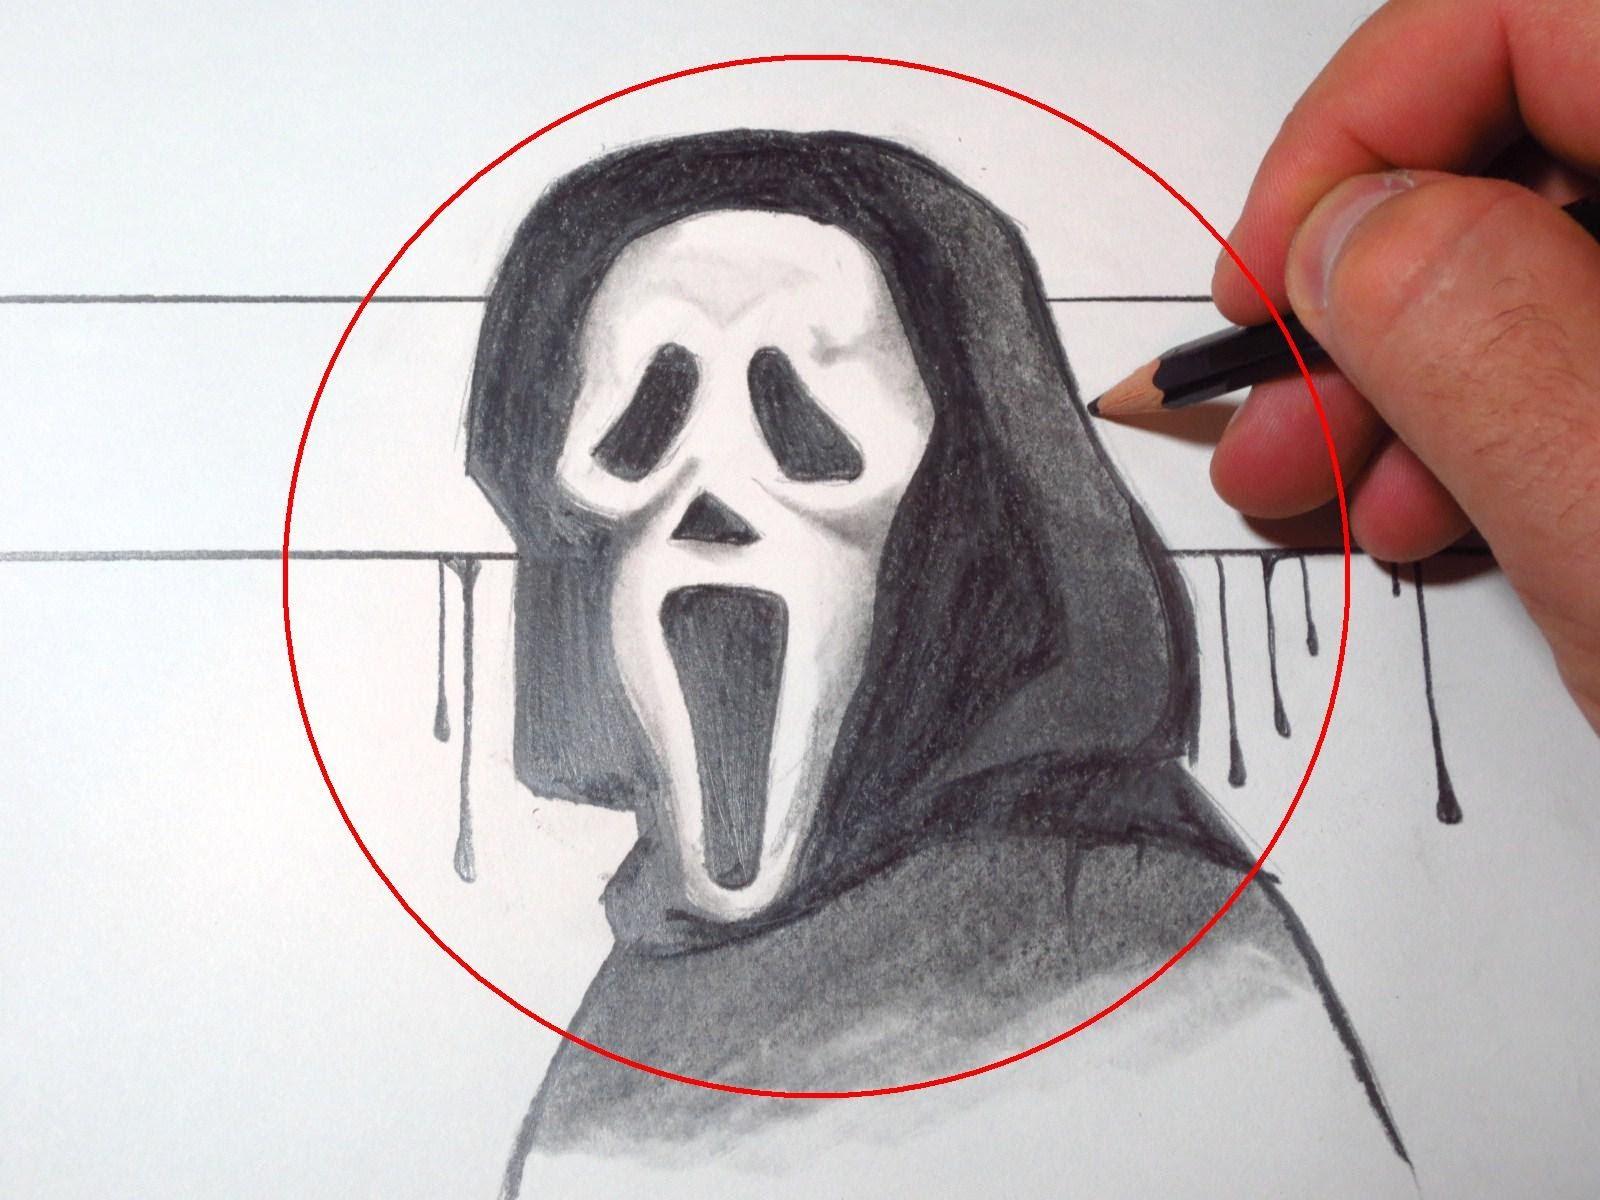 1600x1200 How To Draw Scream Mask (Ghostface)